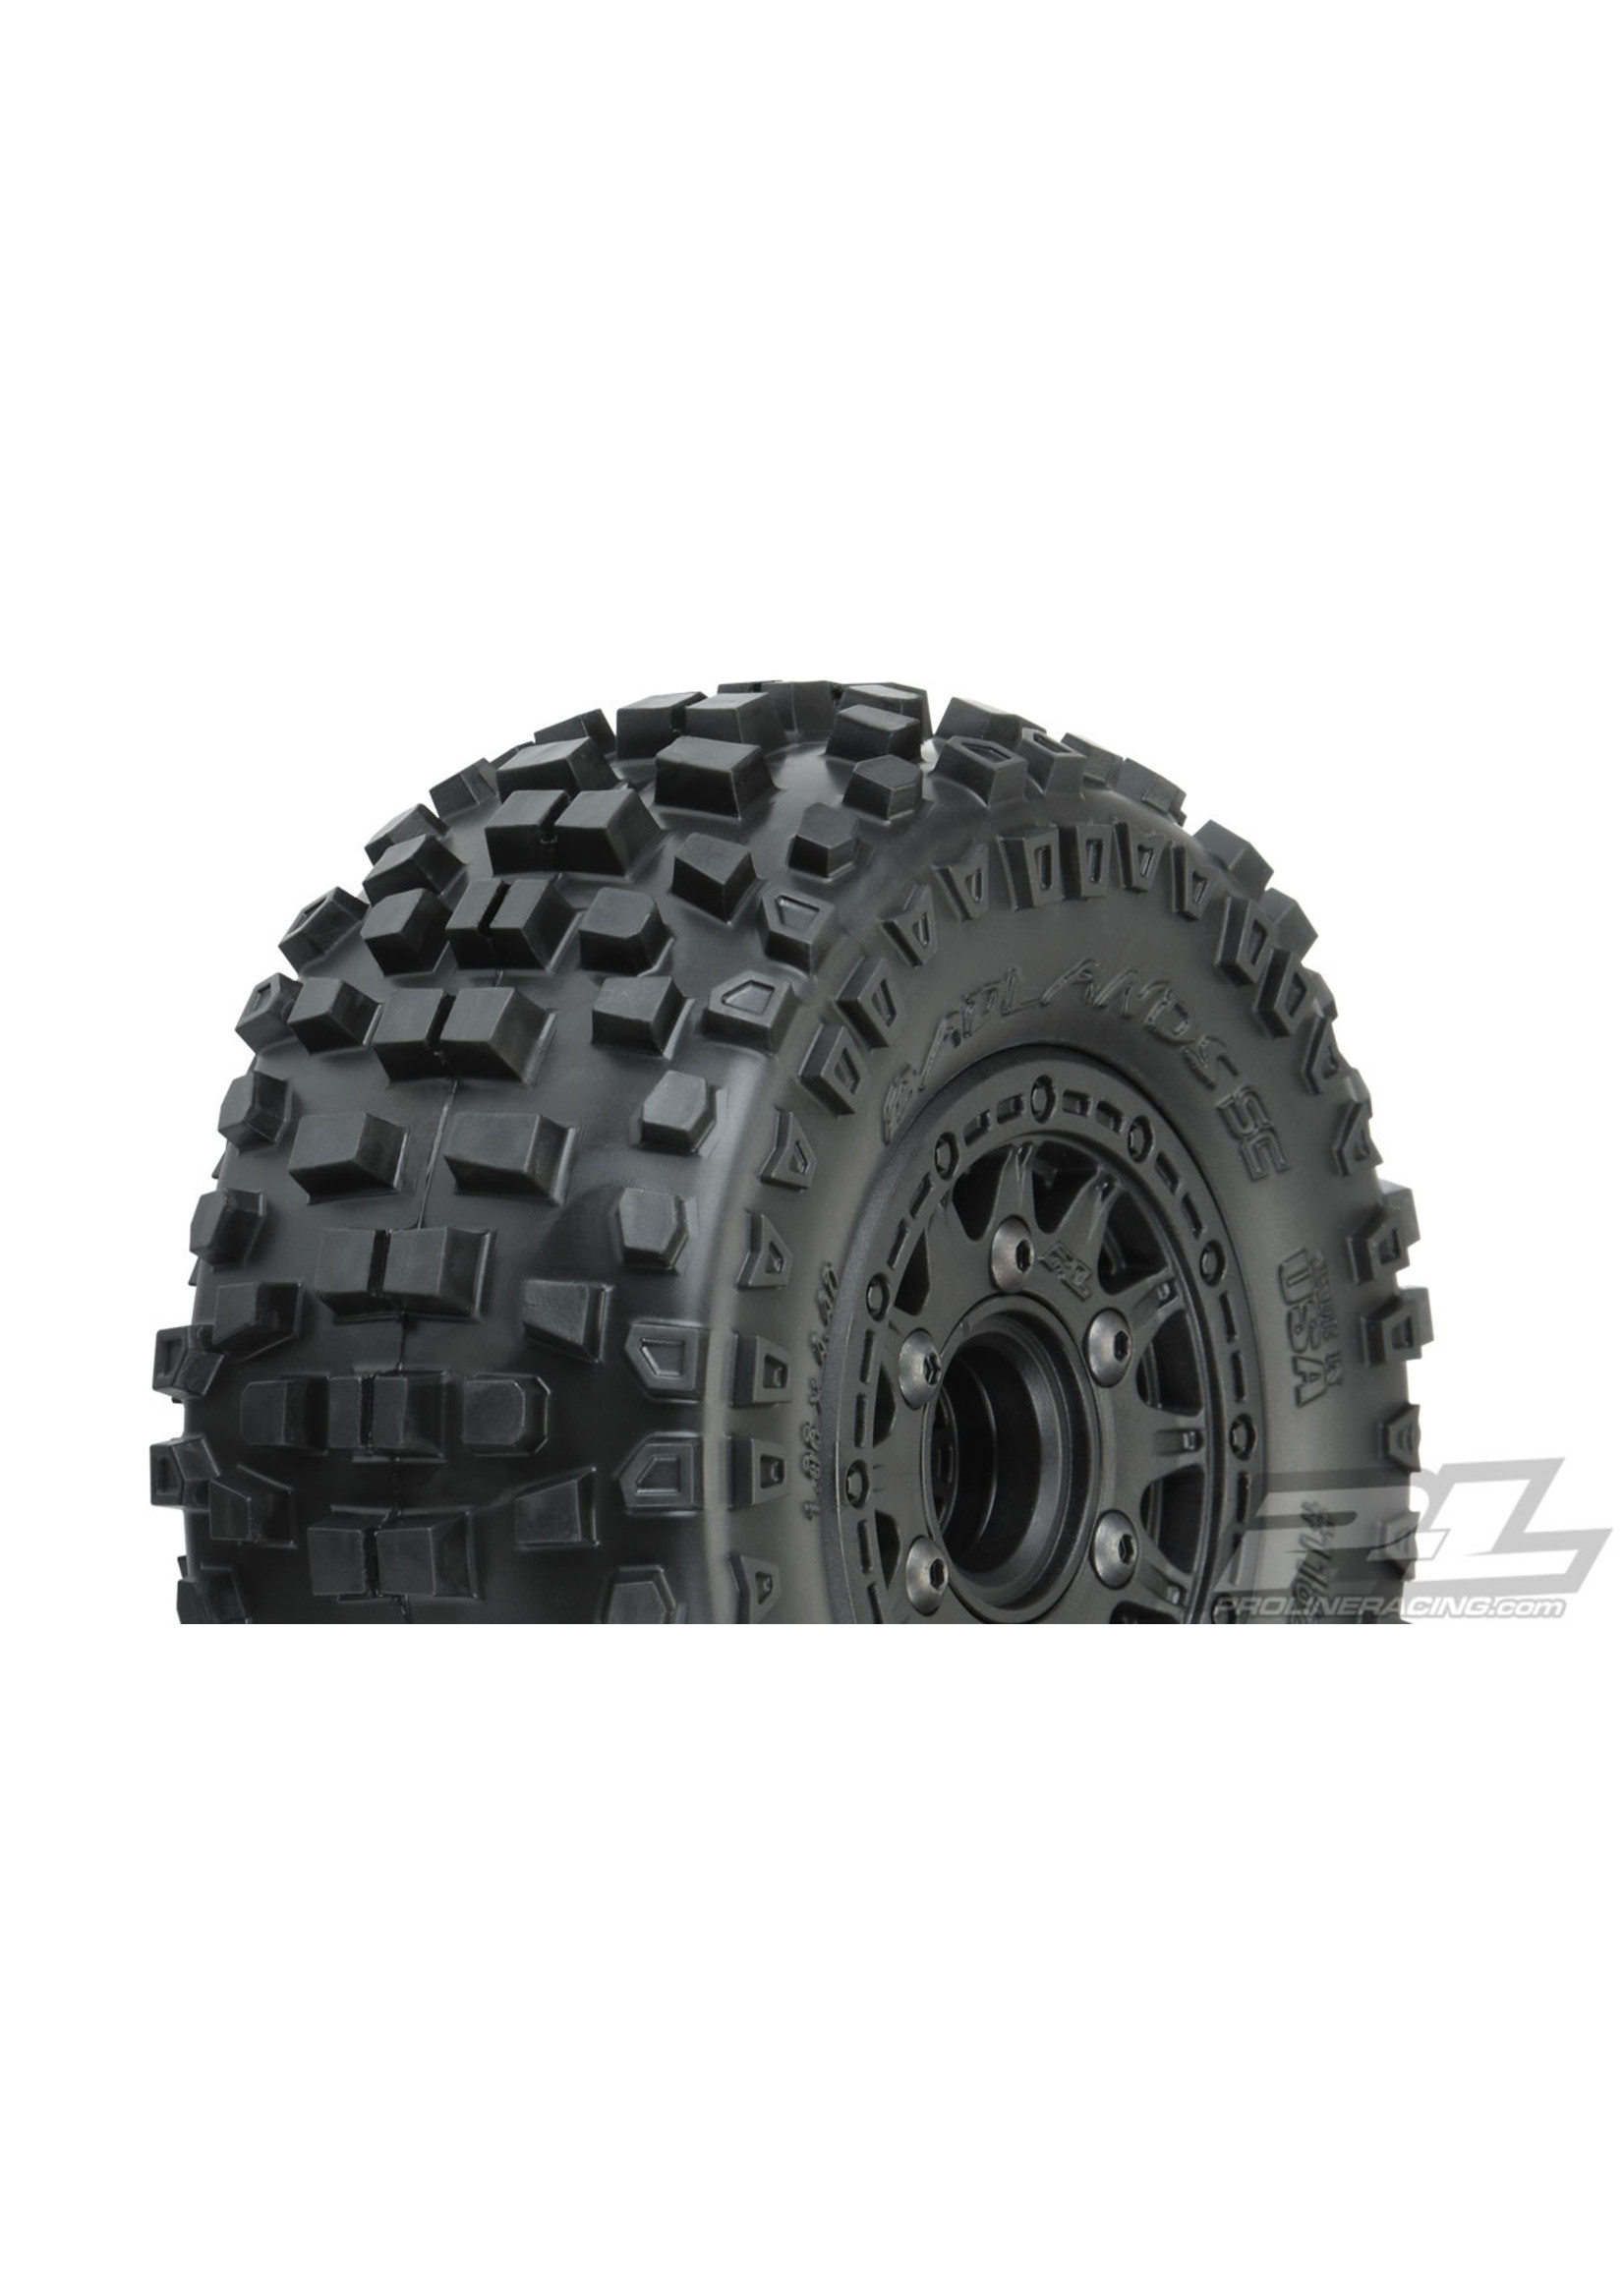 Pro-Line Racing PRO1182-10 Pro-Line Badlands SC MTD Raid 6x30 Slash 2wd/4WD F/R